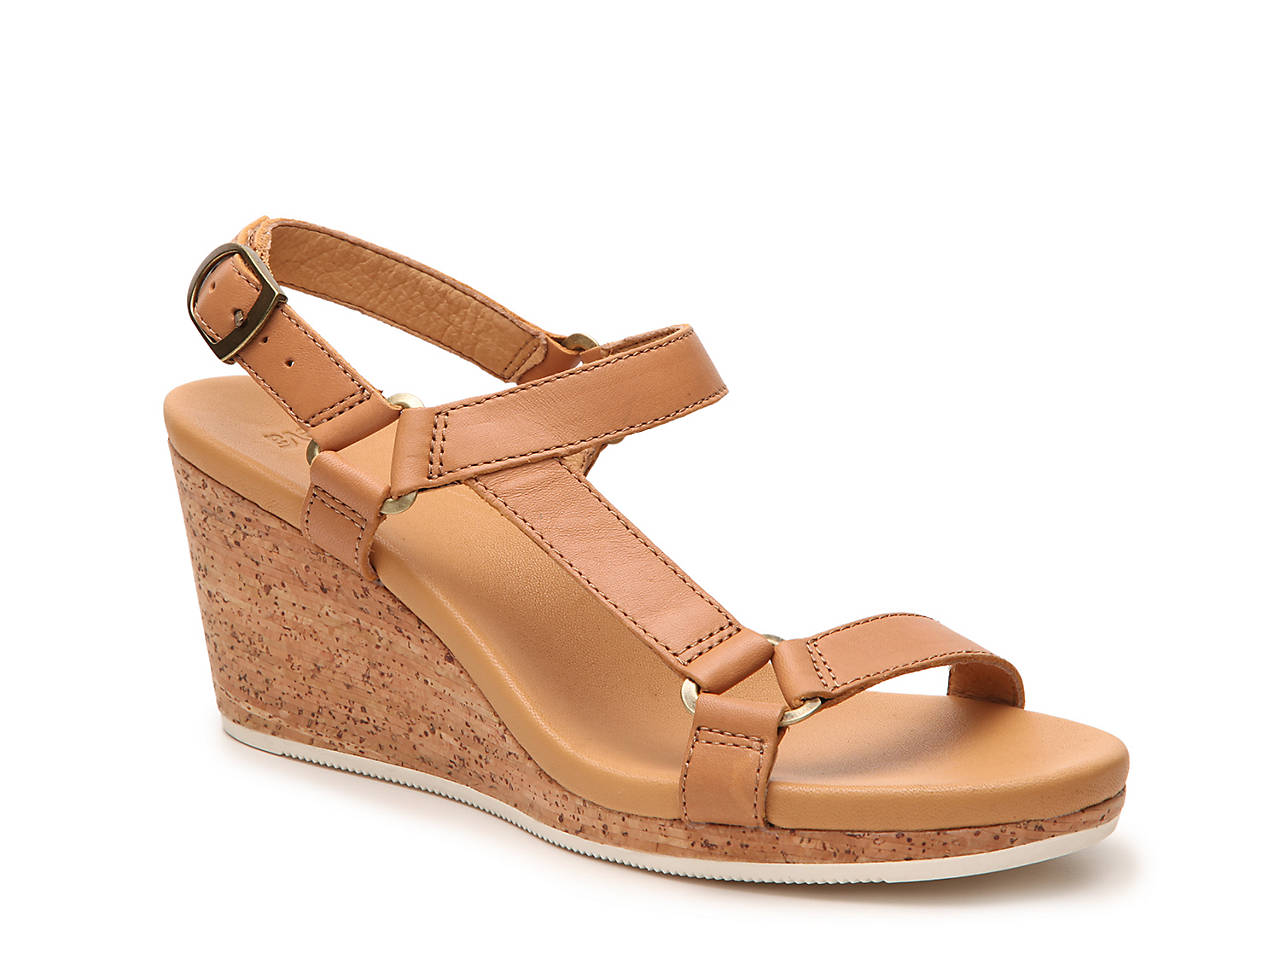 6cf80066f9d1 Teva Arrabelle Universal Wedge Sandal Women s Shoes